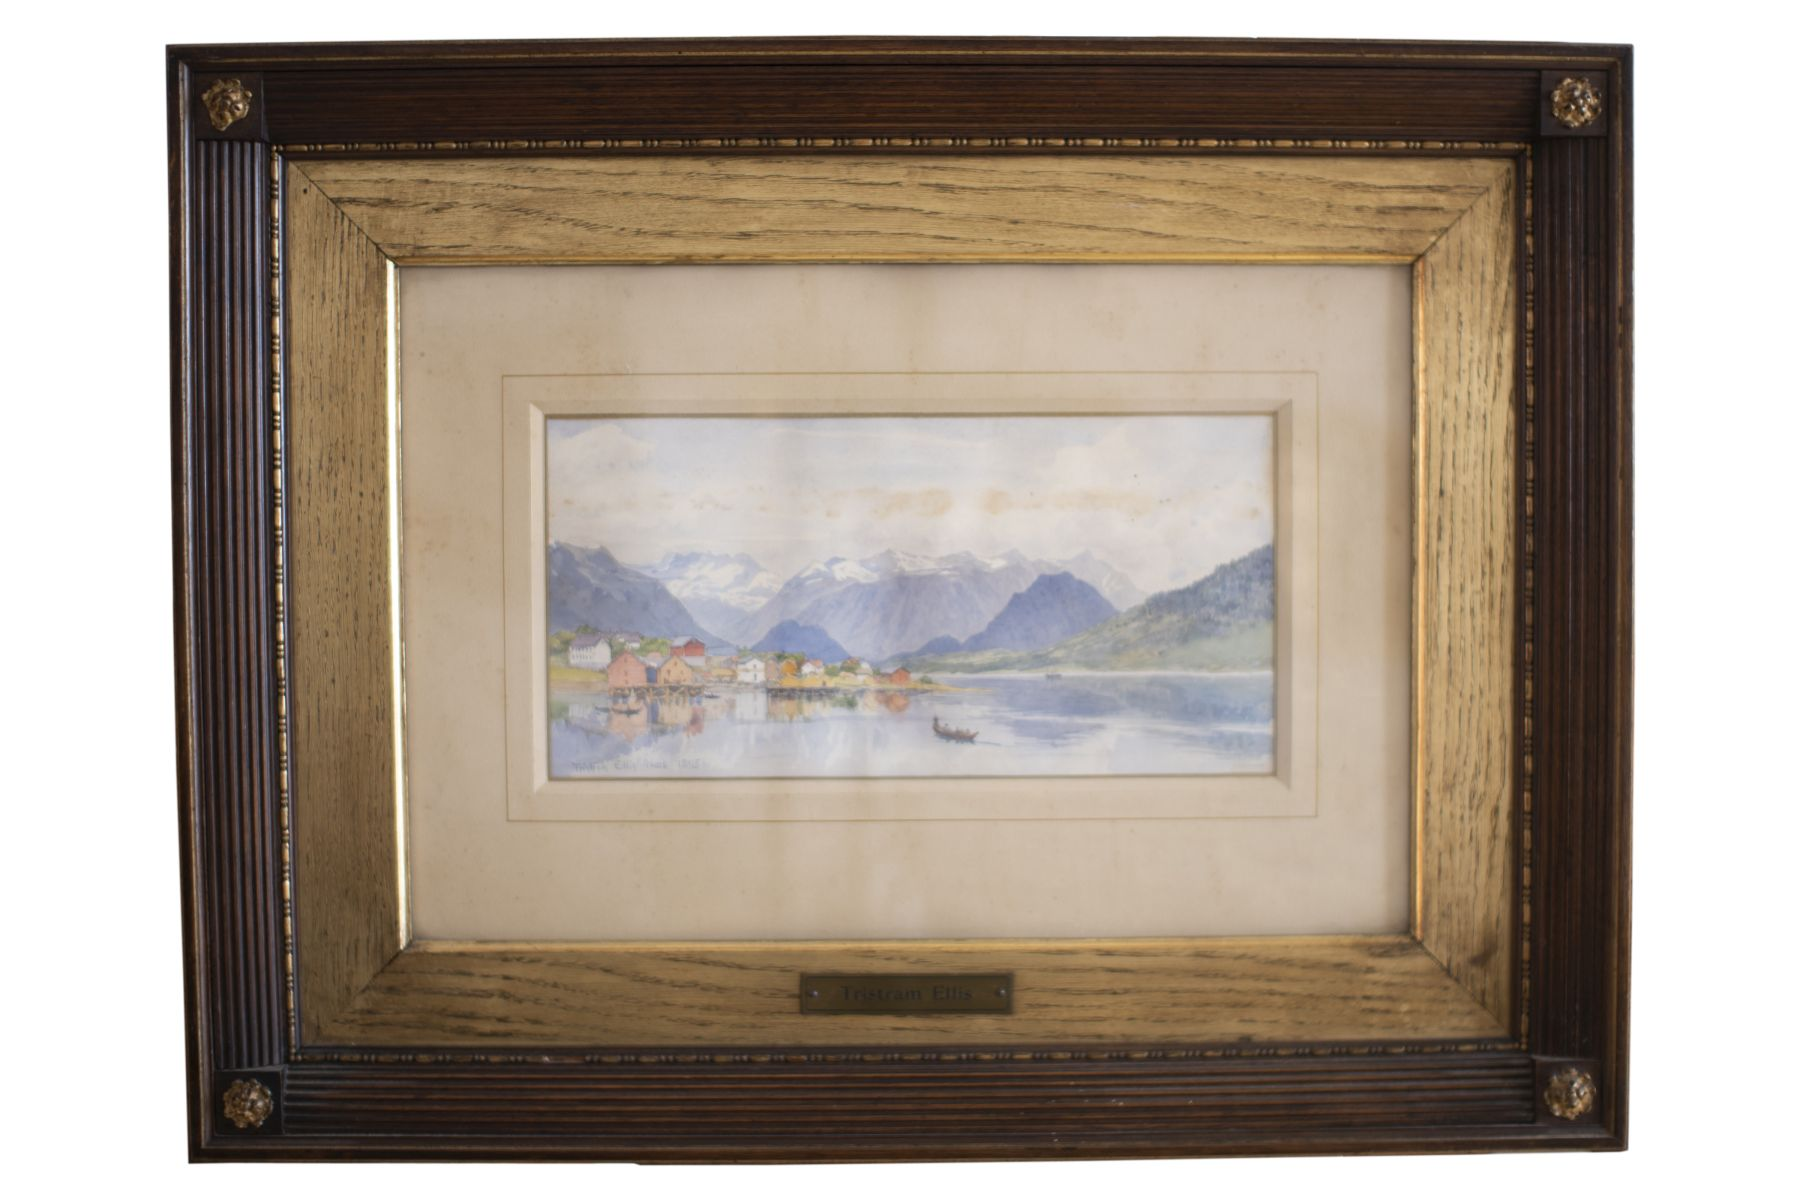 "#144 Tristam Ellis (1844-1922) ""Fiord Landscape in Norway"" | Tristam Ellis (1844-1922) ""Fiordlandschaft in Norwegen"" Image"